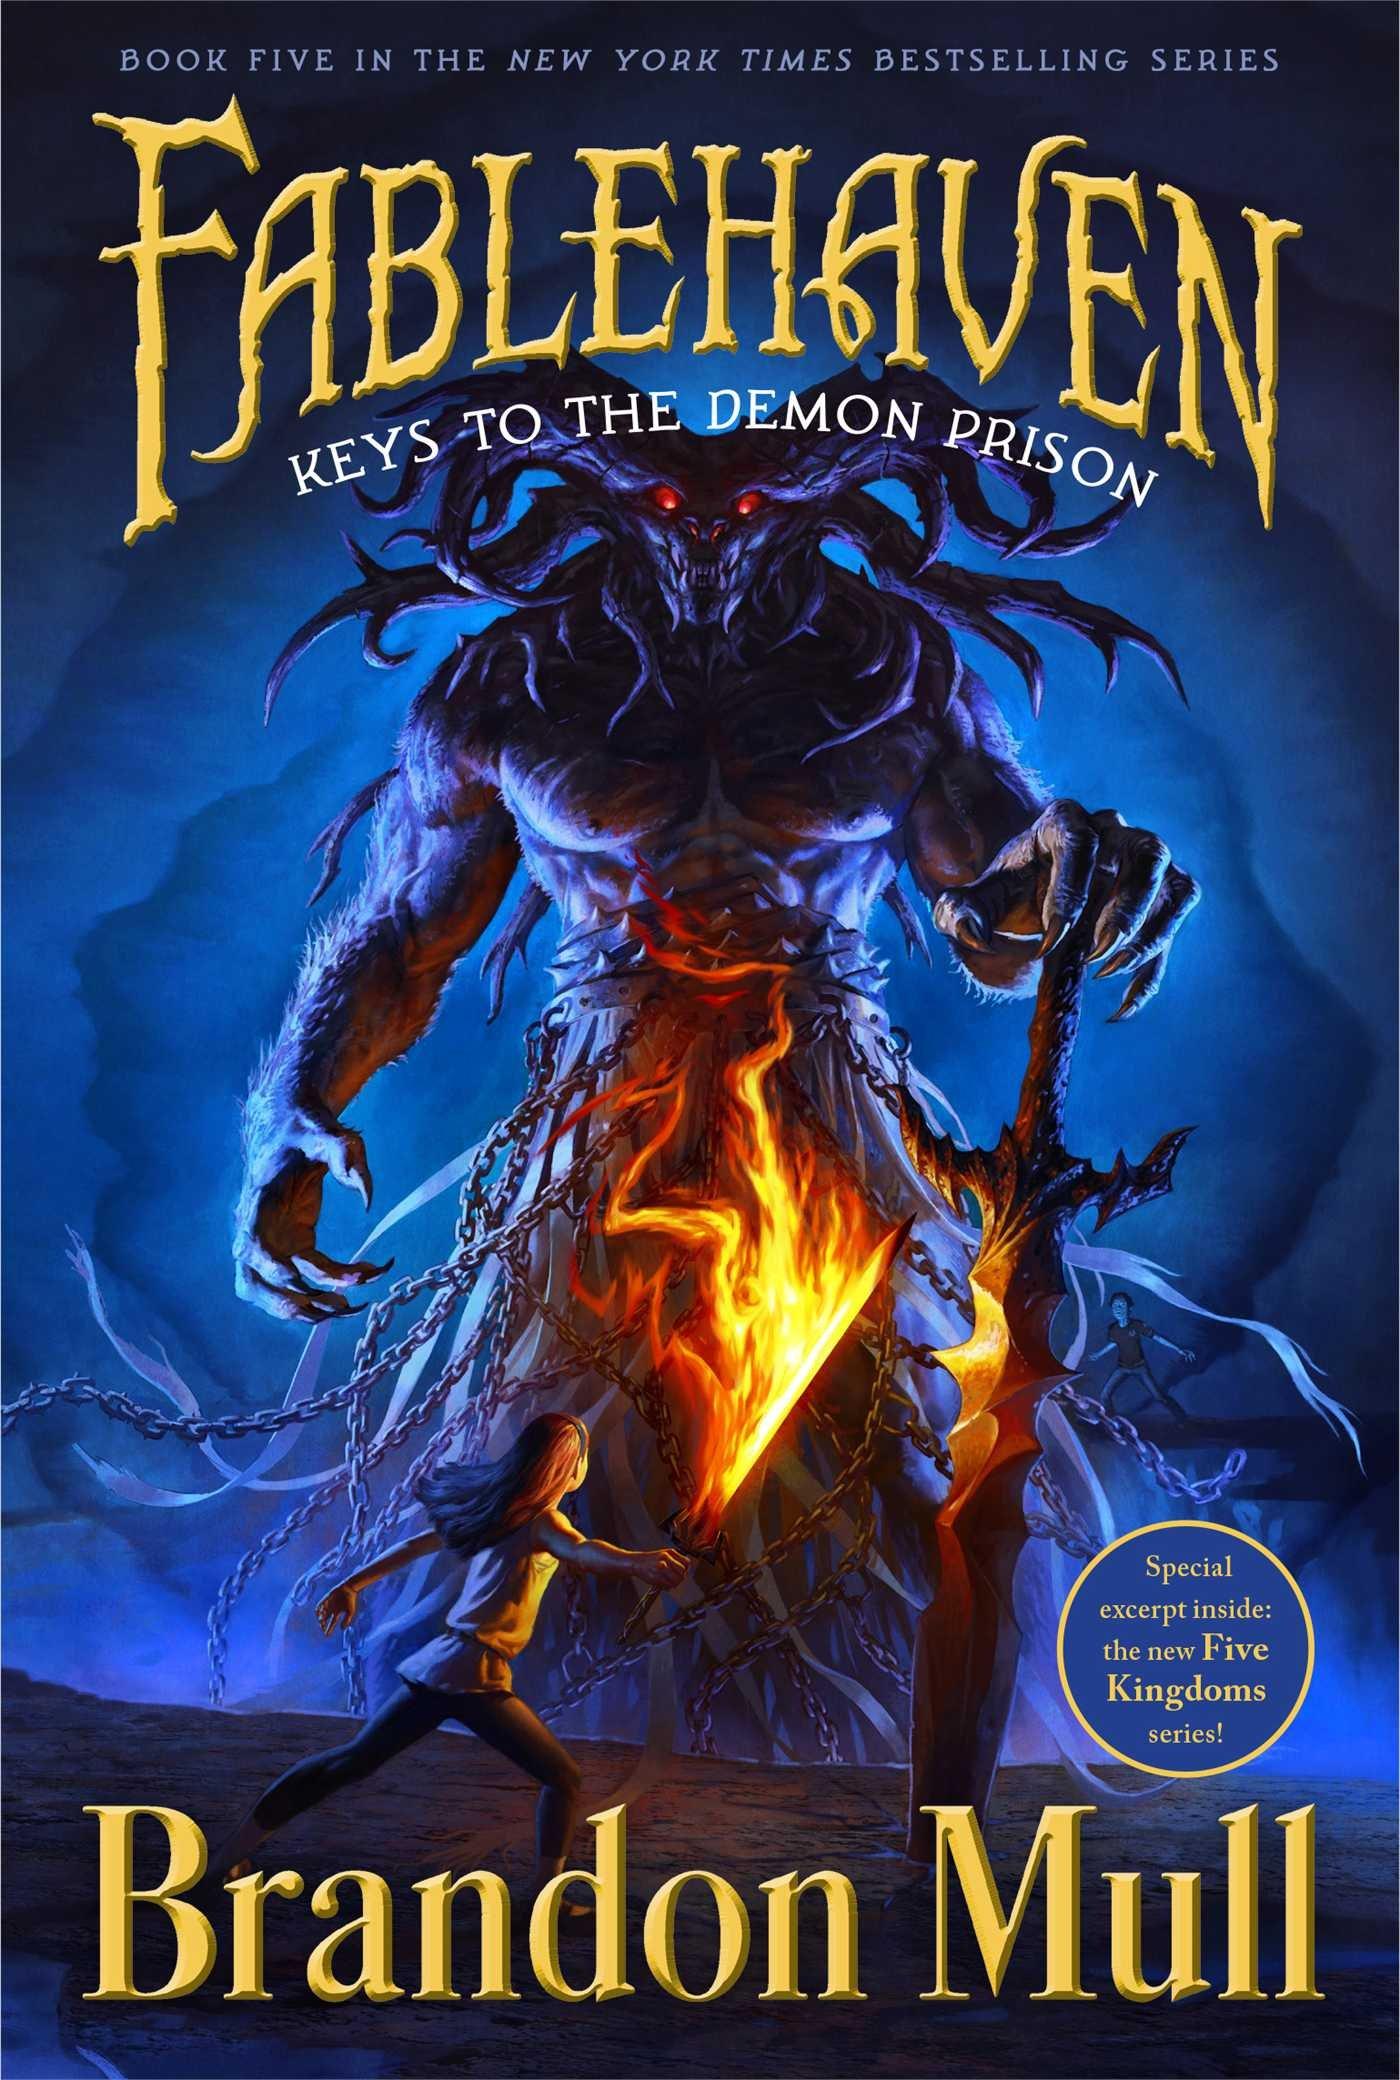 Fablehaven secrets of the dragon sanctuary chapter summaries